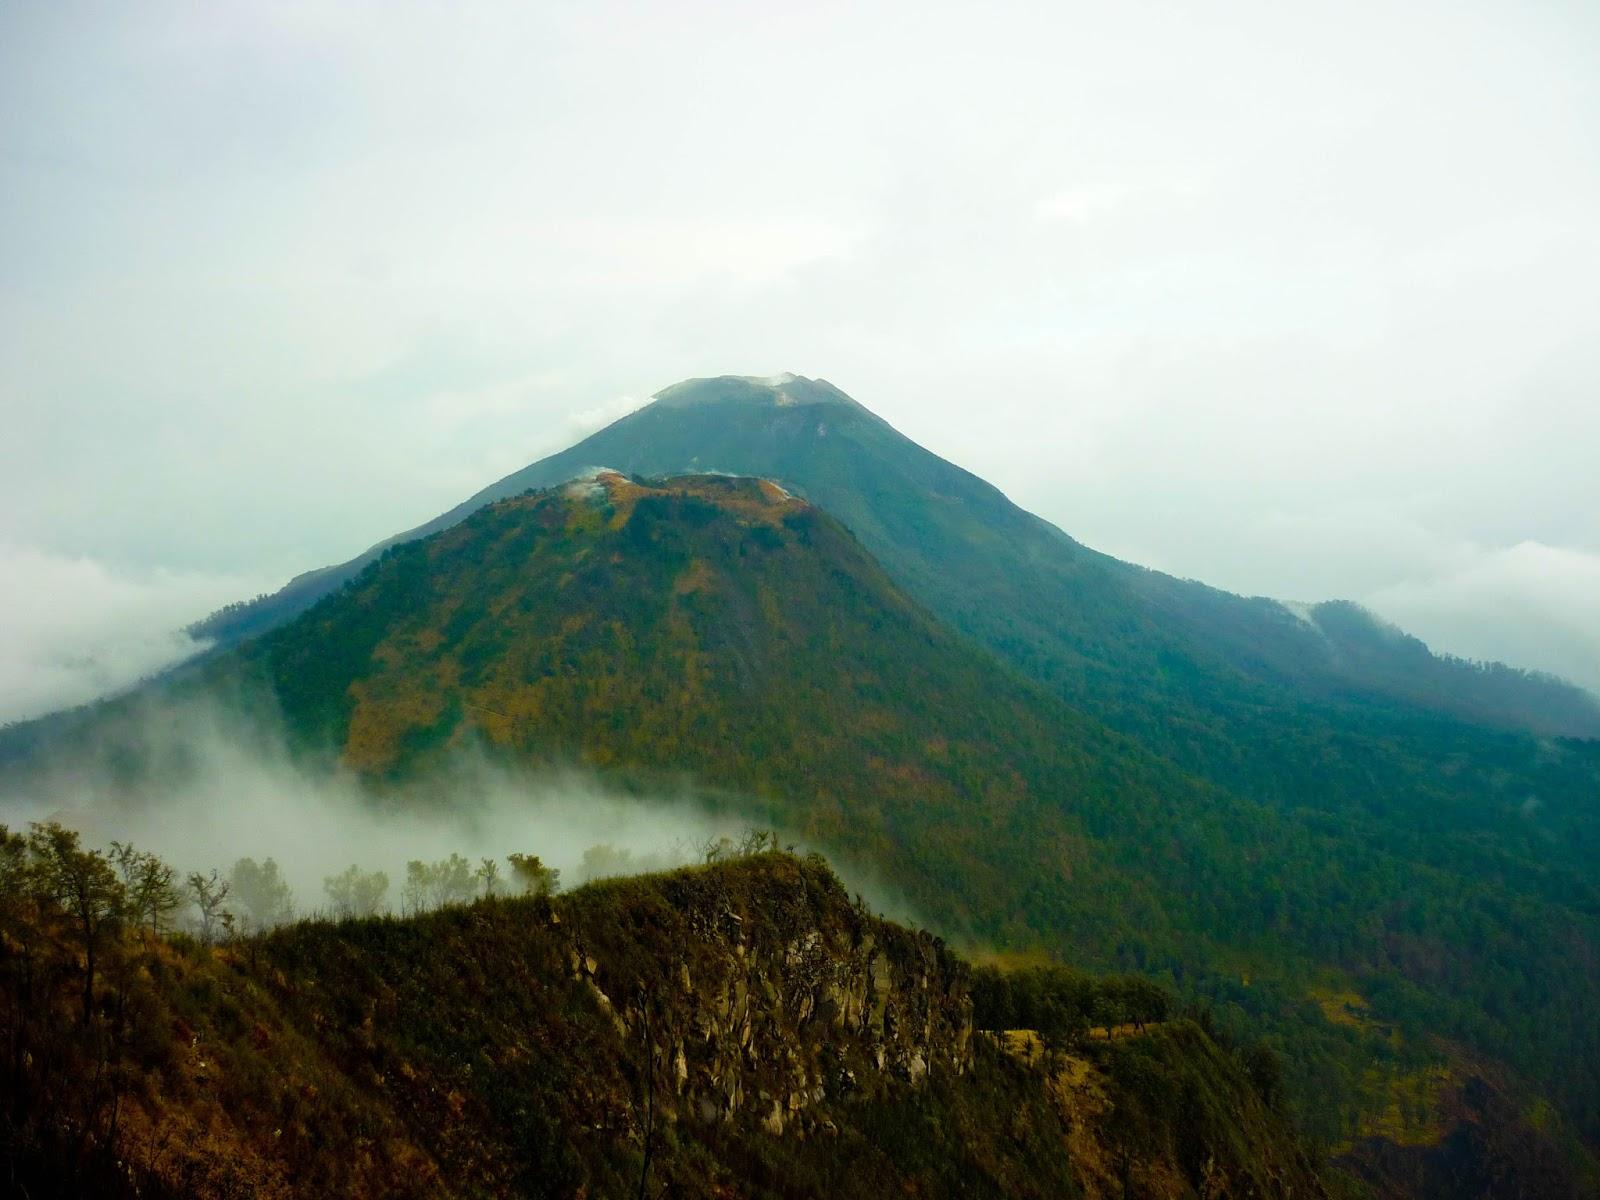 Jalur Pendakian Gunung Arjuno Paling Sering Di Lalui Pendaki Profesional Pengetahuan Wisata Gunung Indonesia